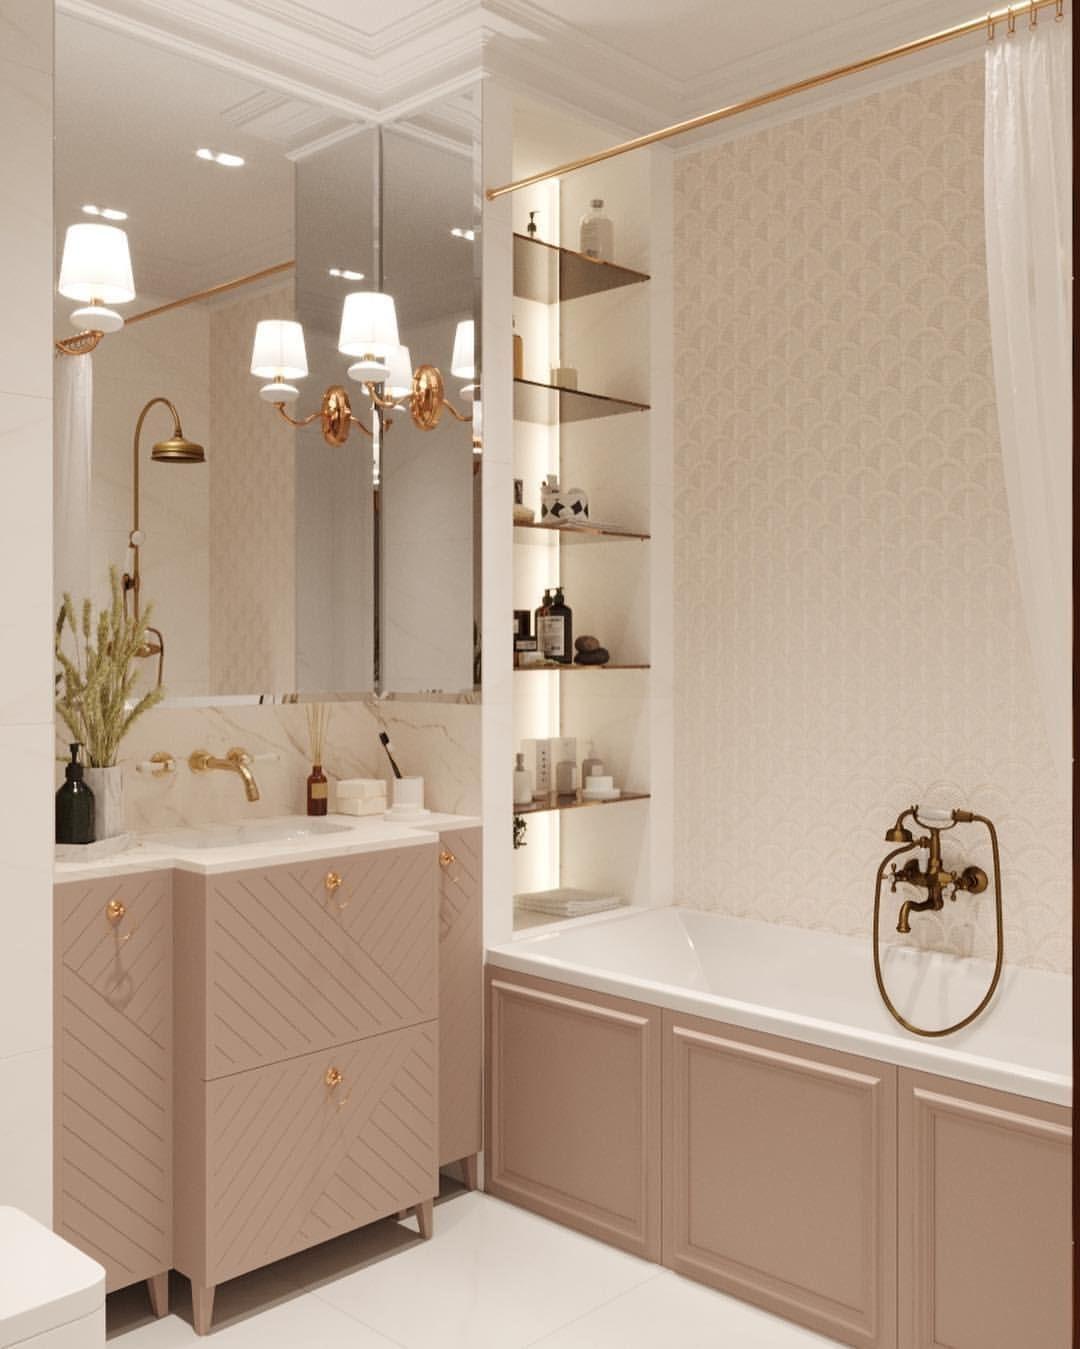 Create A Luxurious Bathrooms Luxuriousbathrooms Luxury Bathroom Ideas Luxury Bathroom Bathr Bathroom Interior Design Bathroom Decor Luxury Bathroom Interior